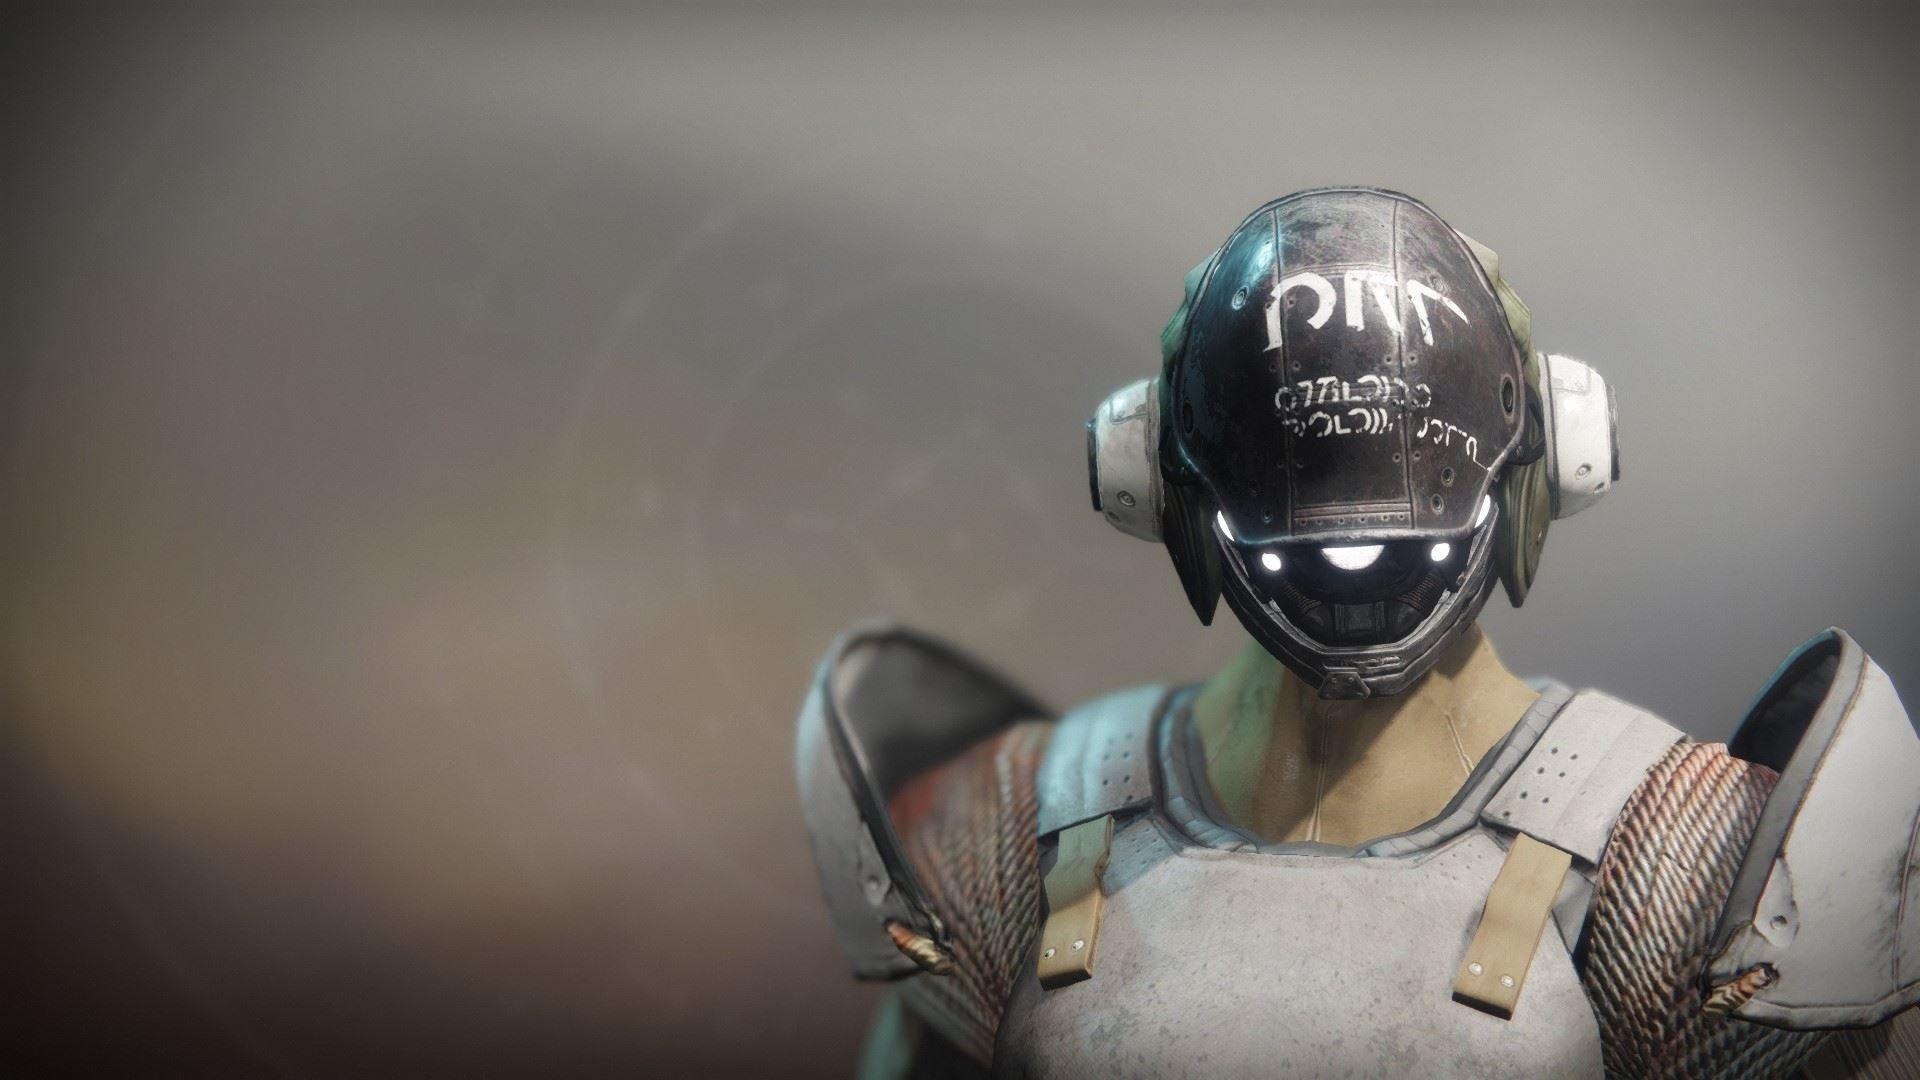 An in-game render of the Scatterhorn Helm.